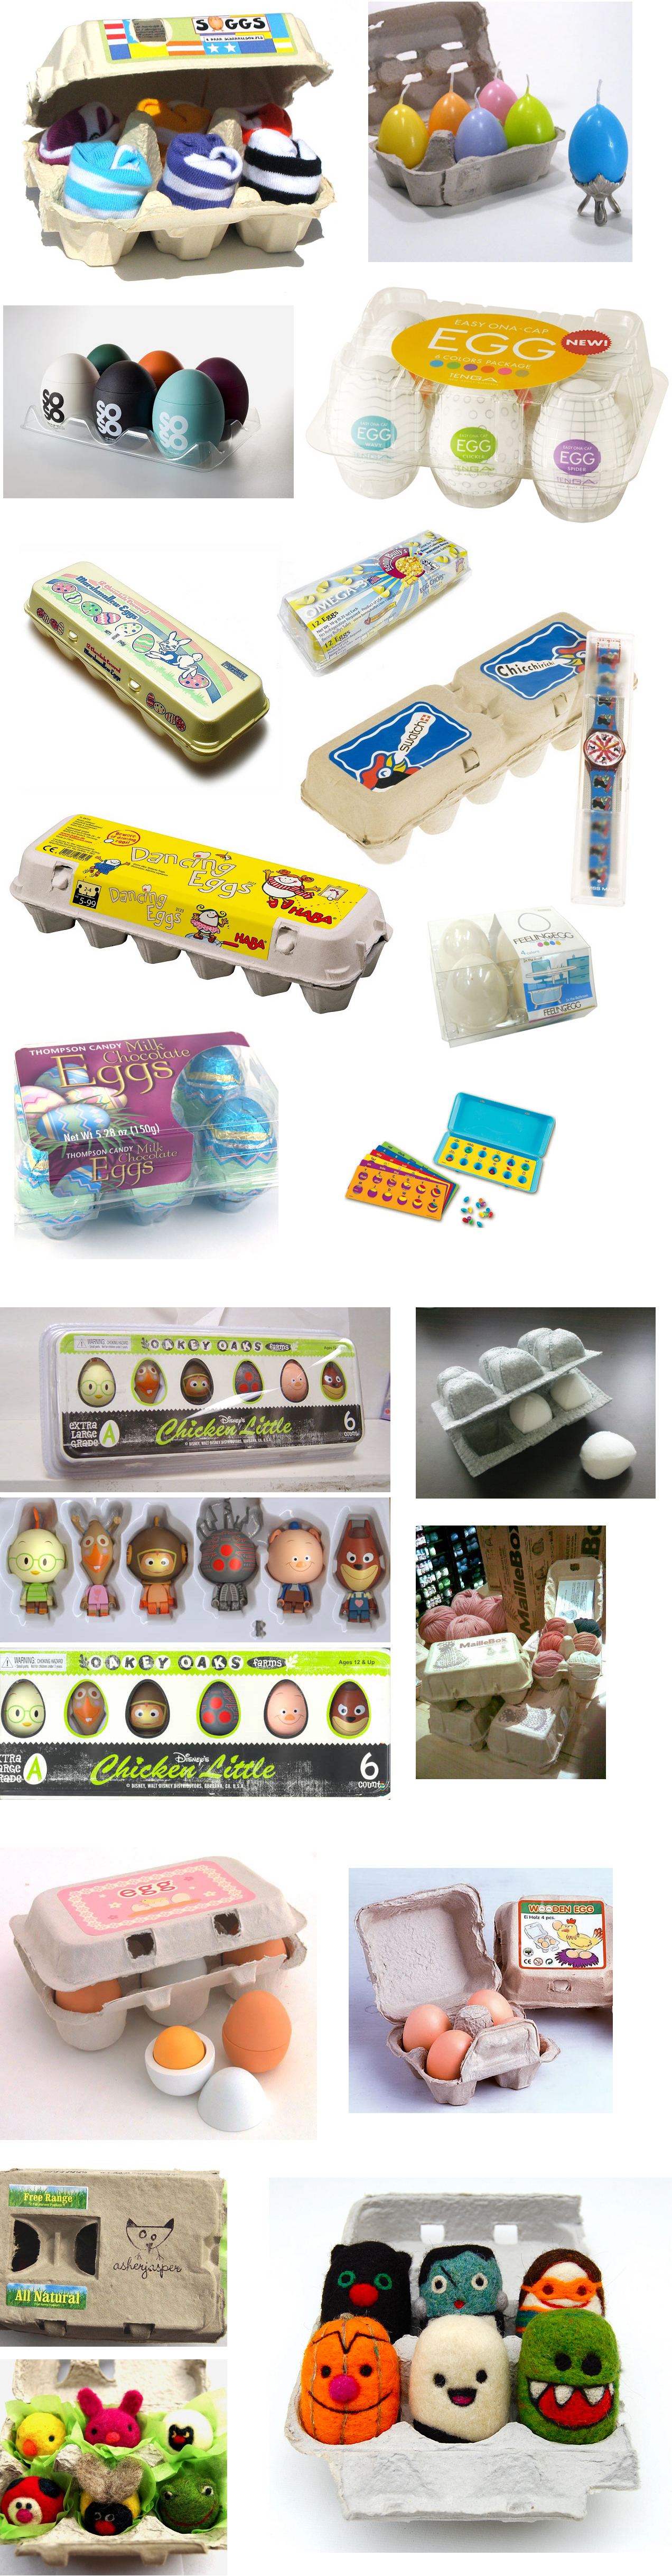 Eggcartonpacks